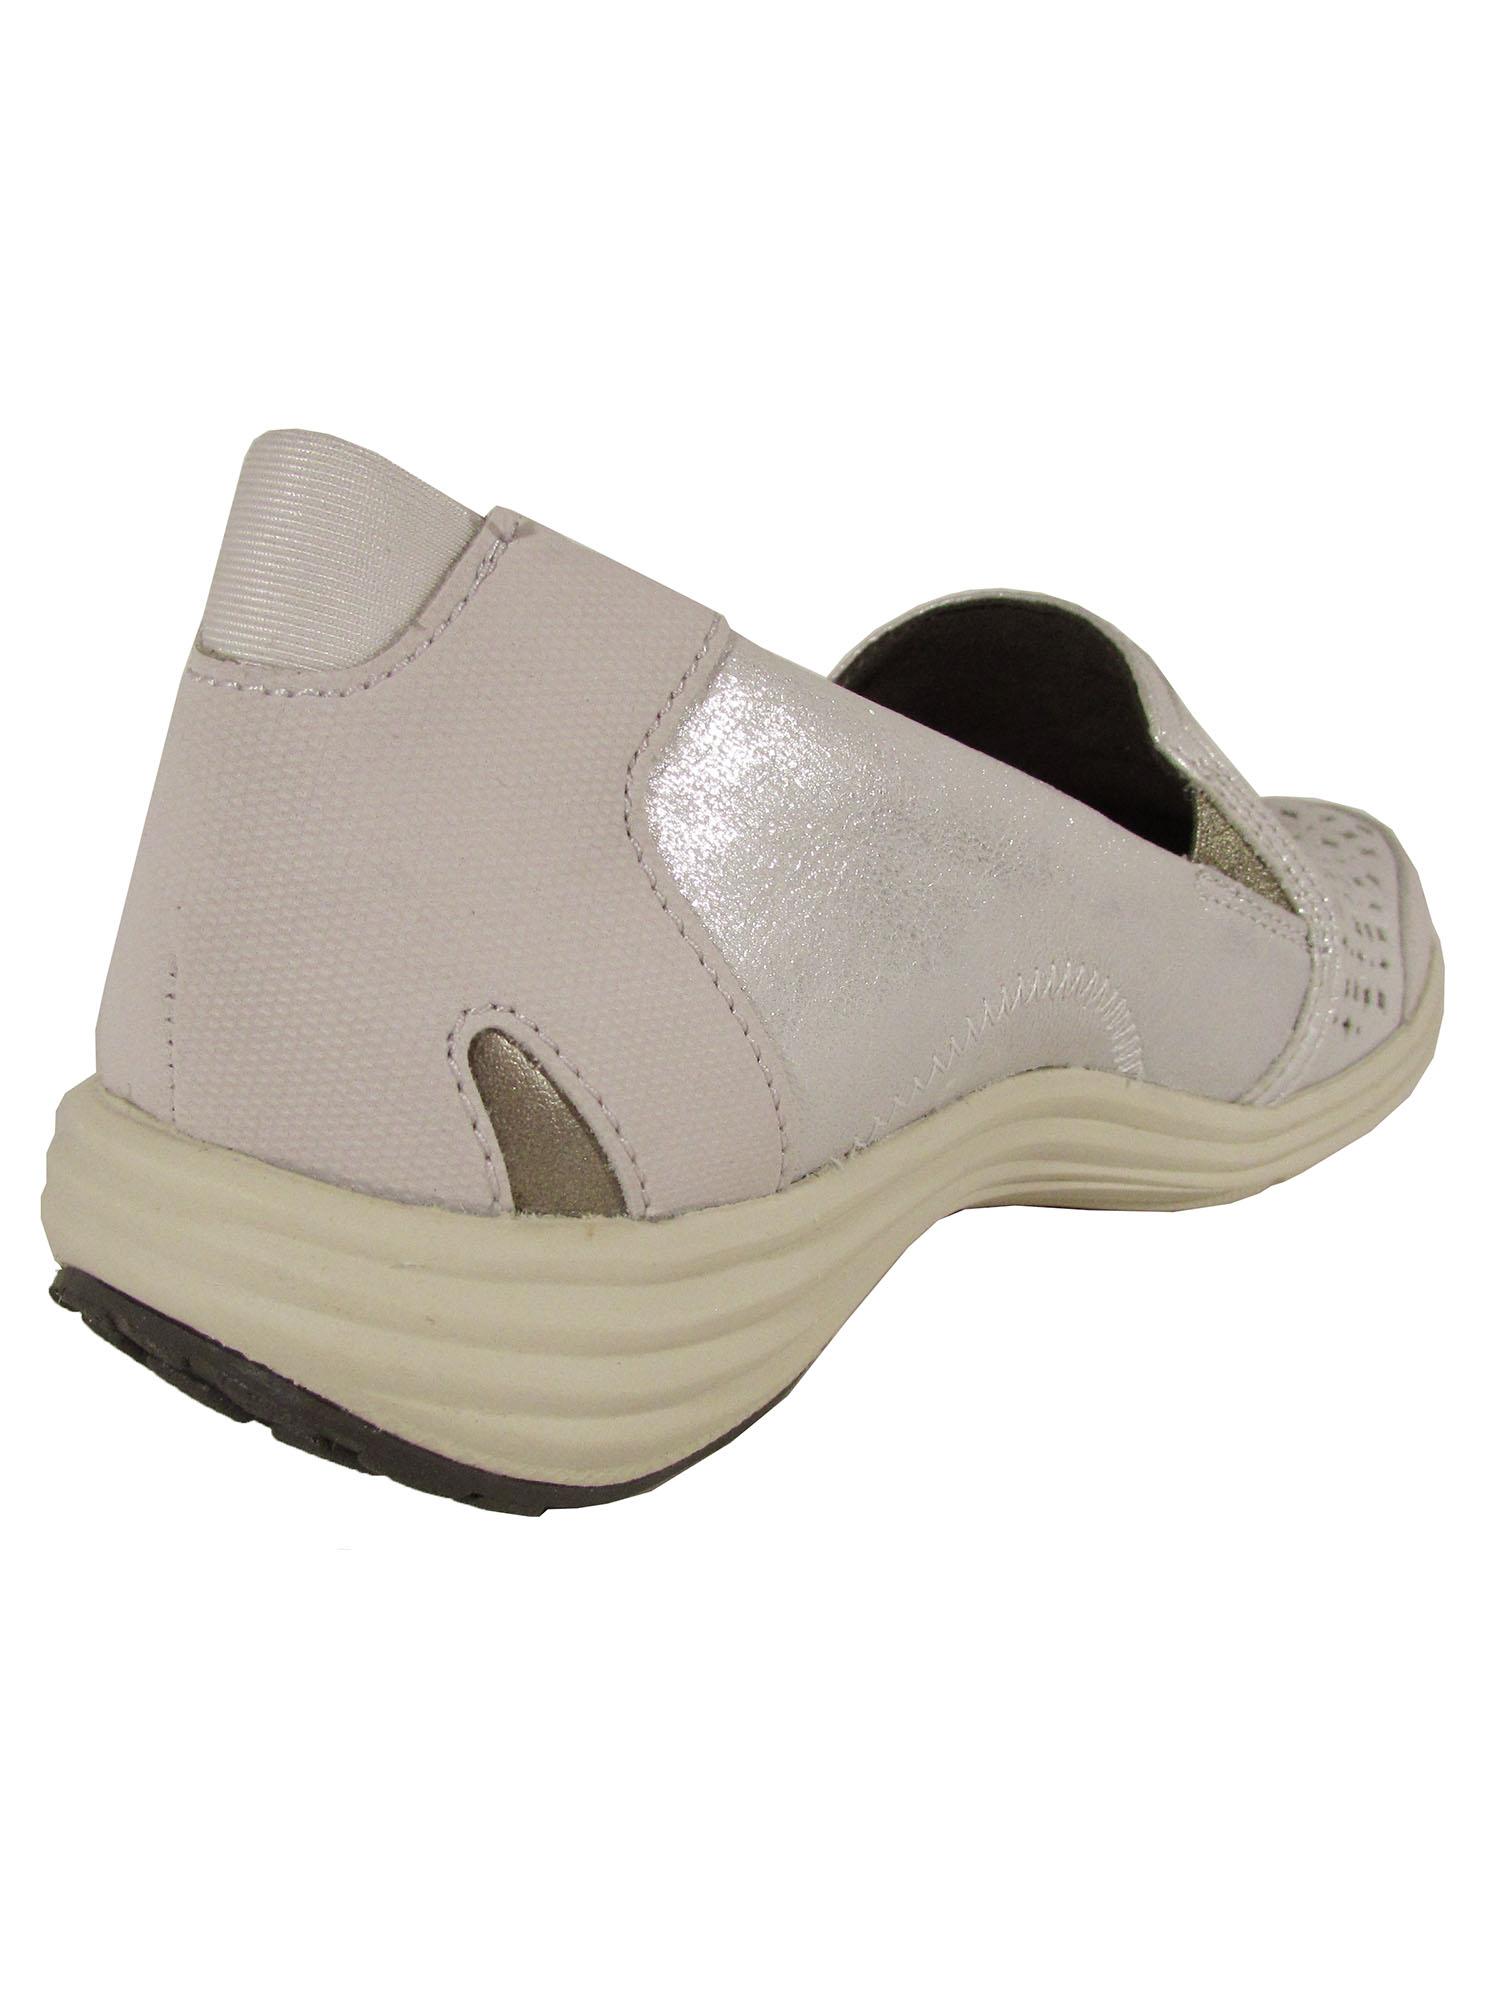 Aravon-Womens-Bonnie-AR-Slip-On-Loafer-Shoes miniatura 10